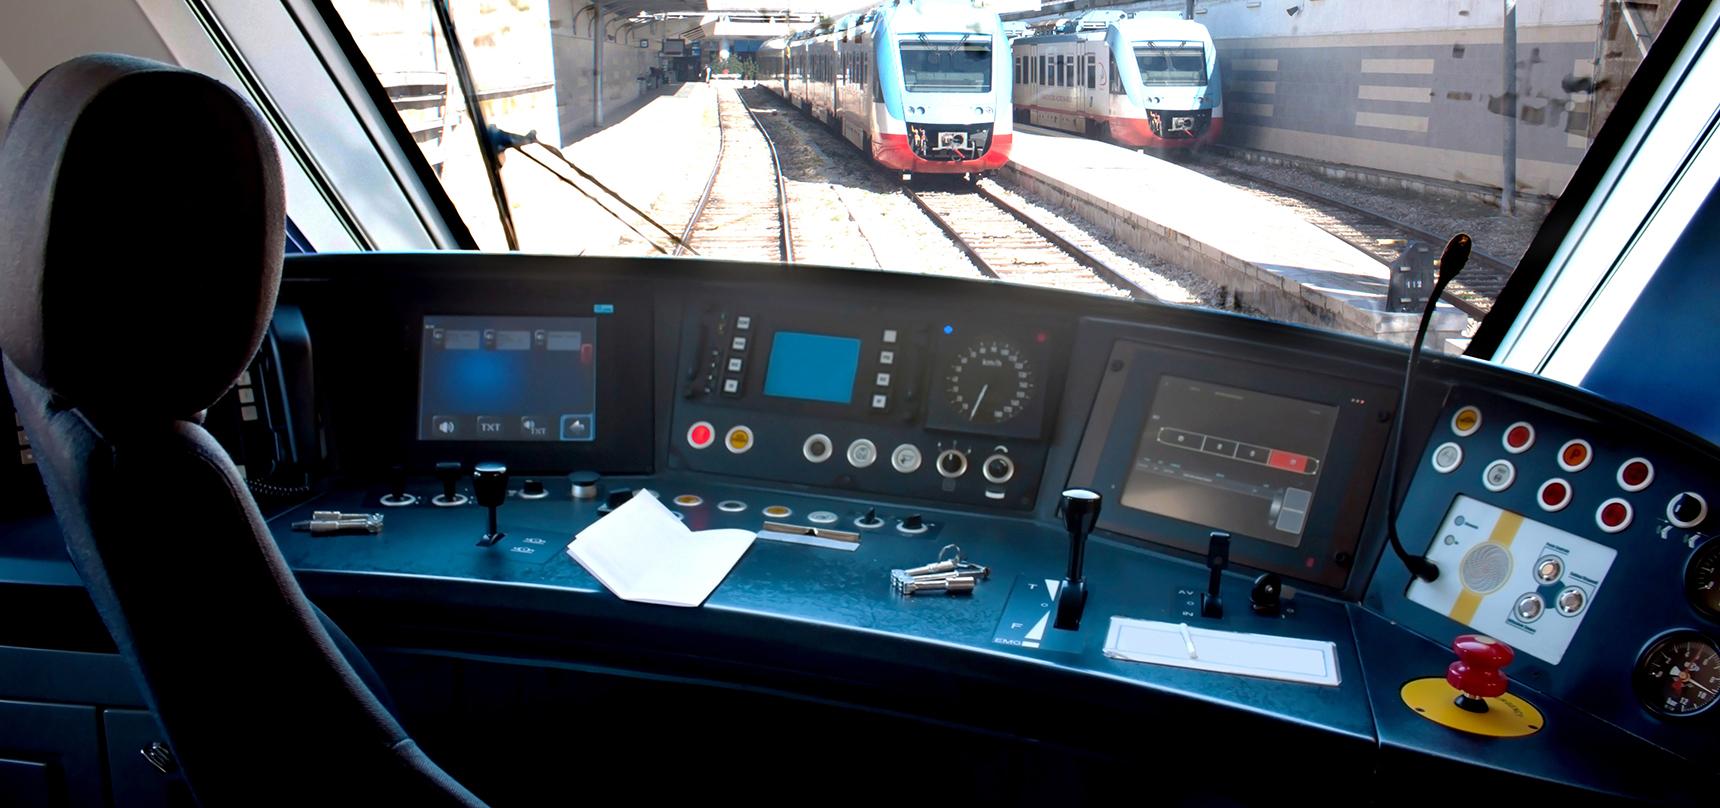 LCD control panel on automotive train